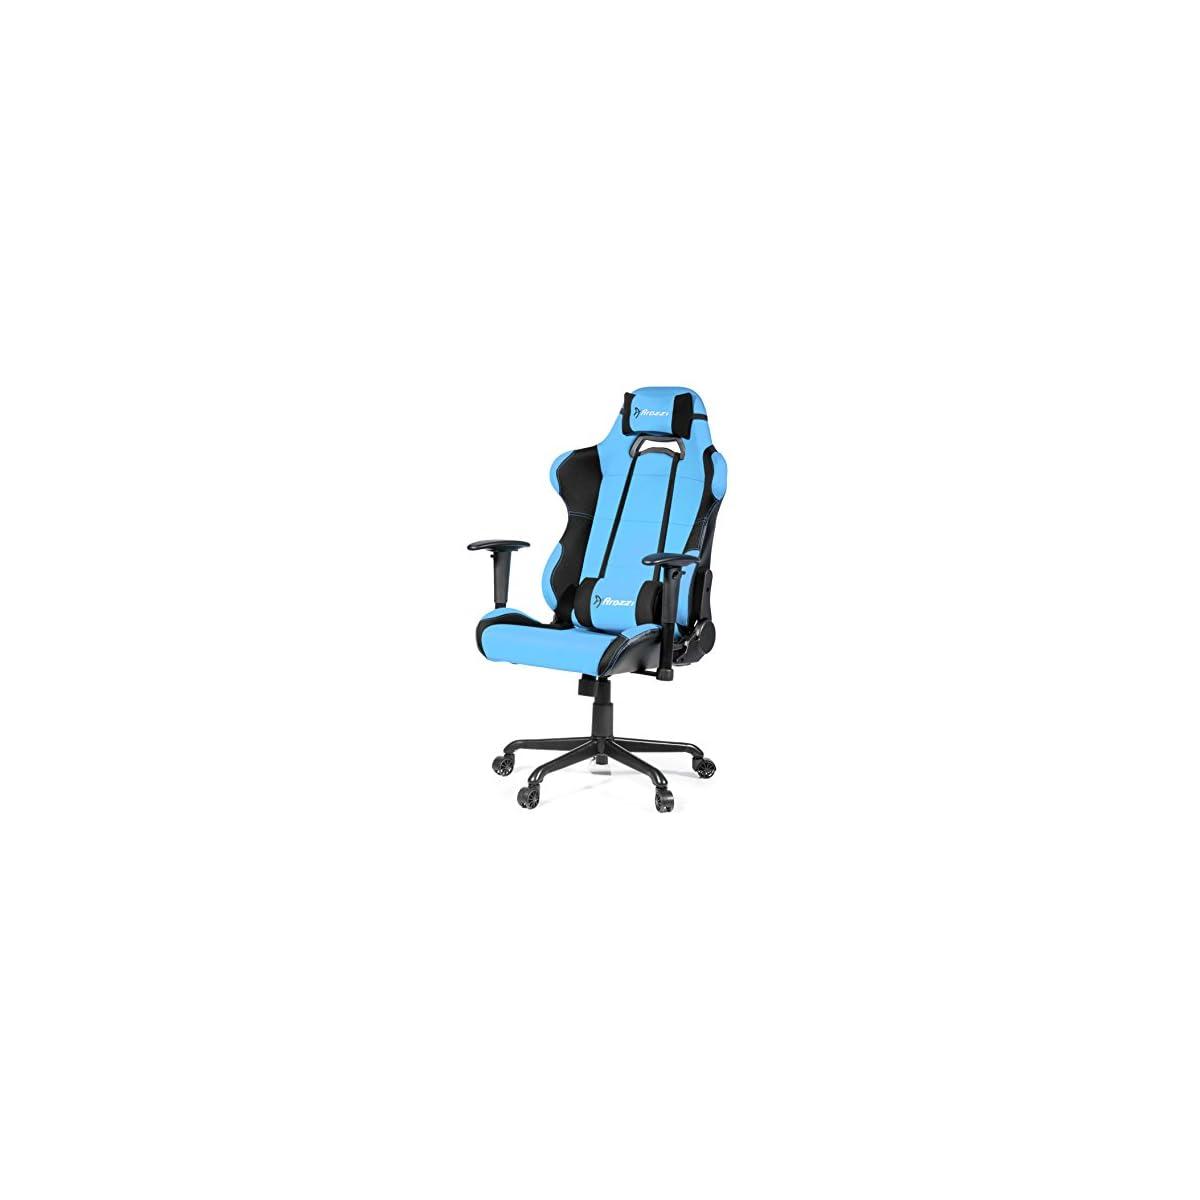 41xRYM%2BhOIL. SS1200  - Arozzi Torretta XL - Silla (Asiento Acolchado, Respaldo Acolchado, Azul, Azul, Negro, Tela)